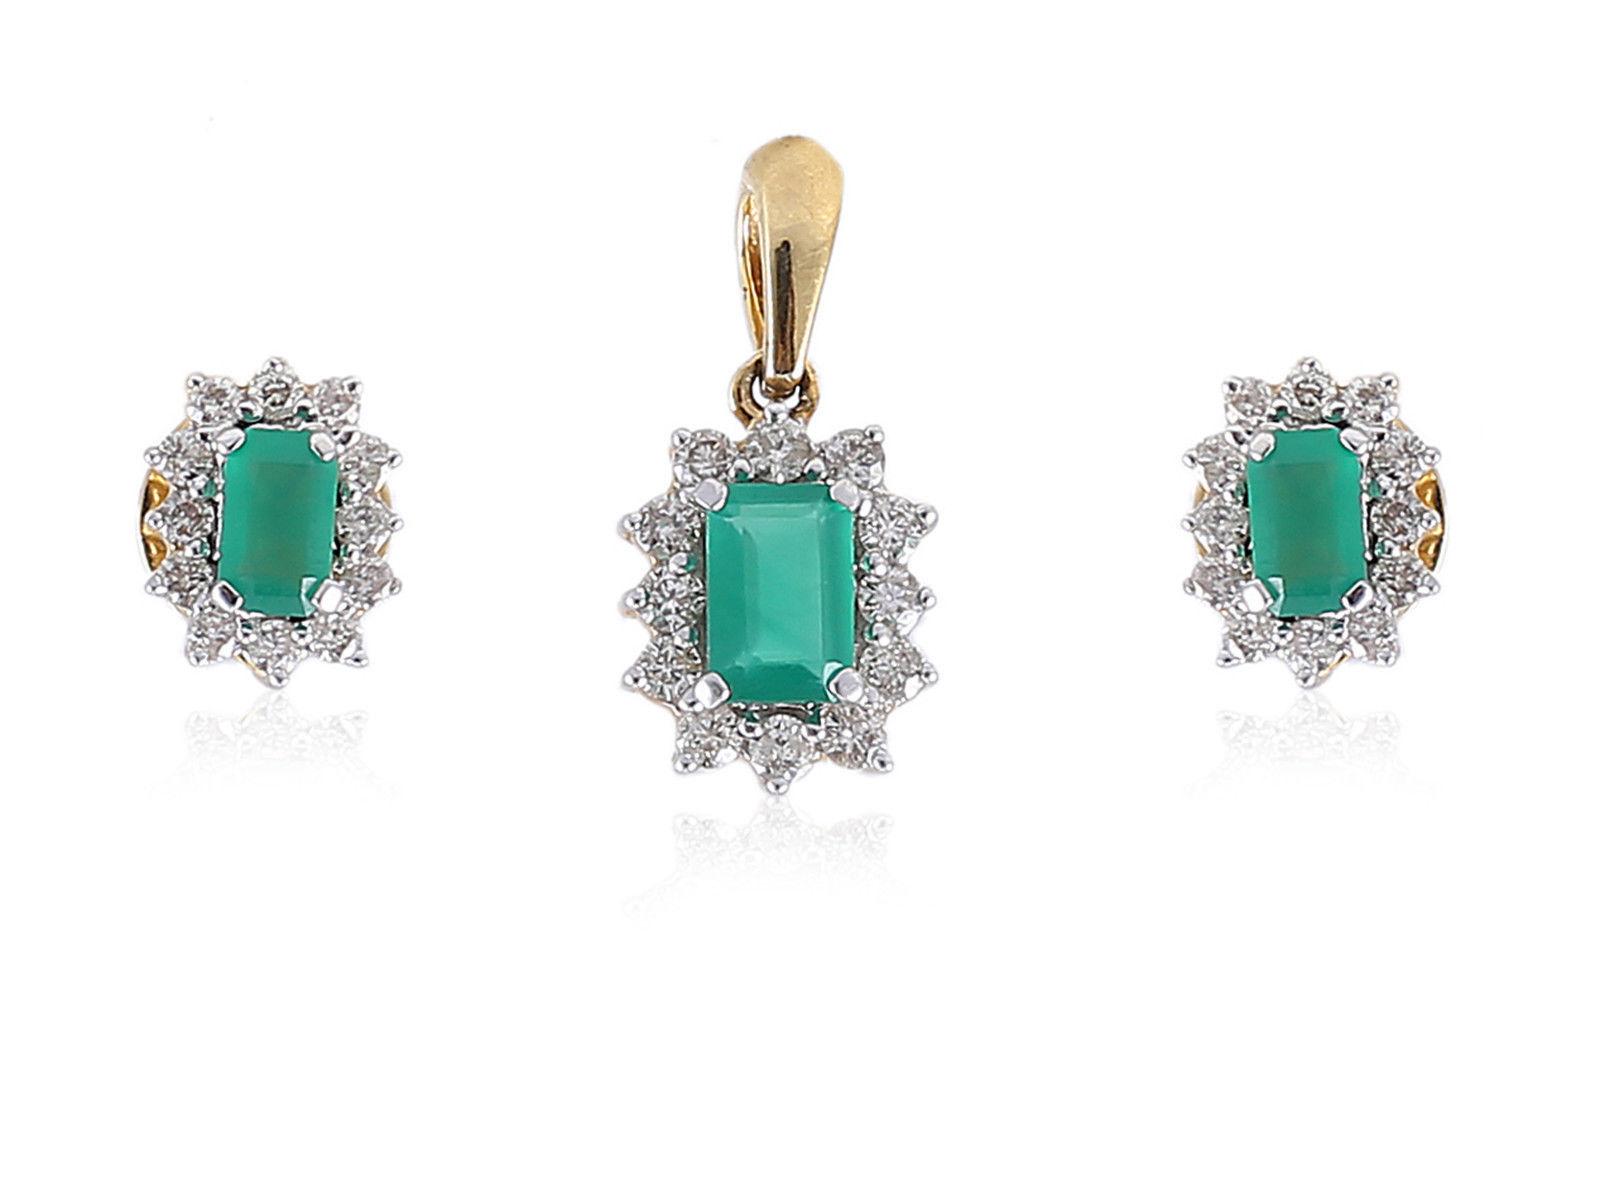 1.49 Cts Round Brilliant Cut Diamonds Emerald Pendant Earrings Set In 18K gold